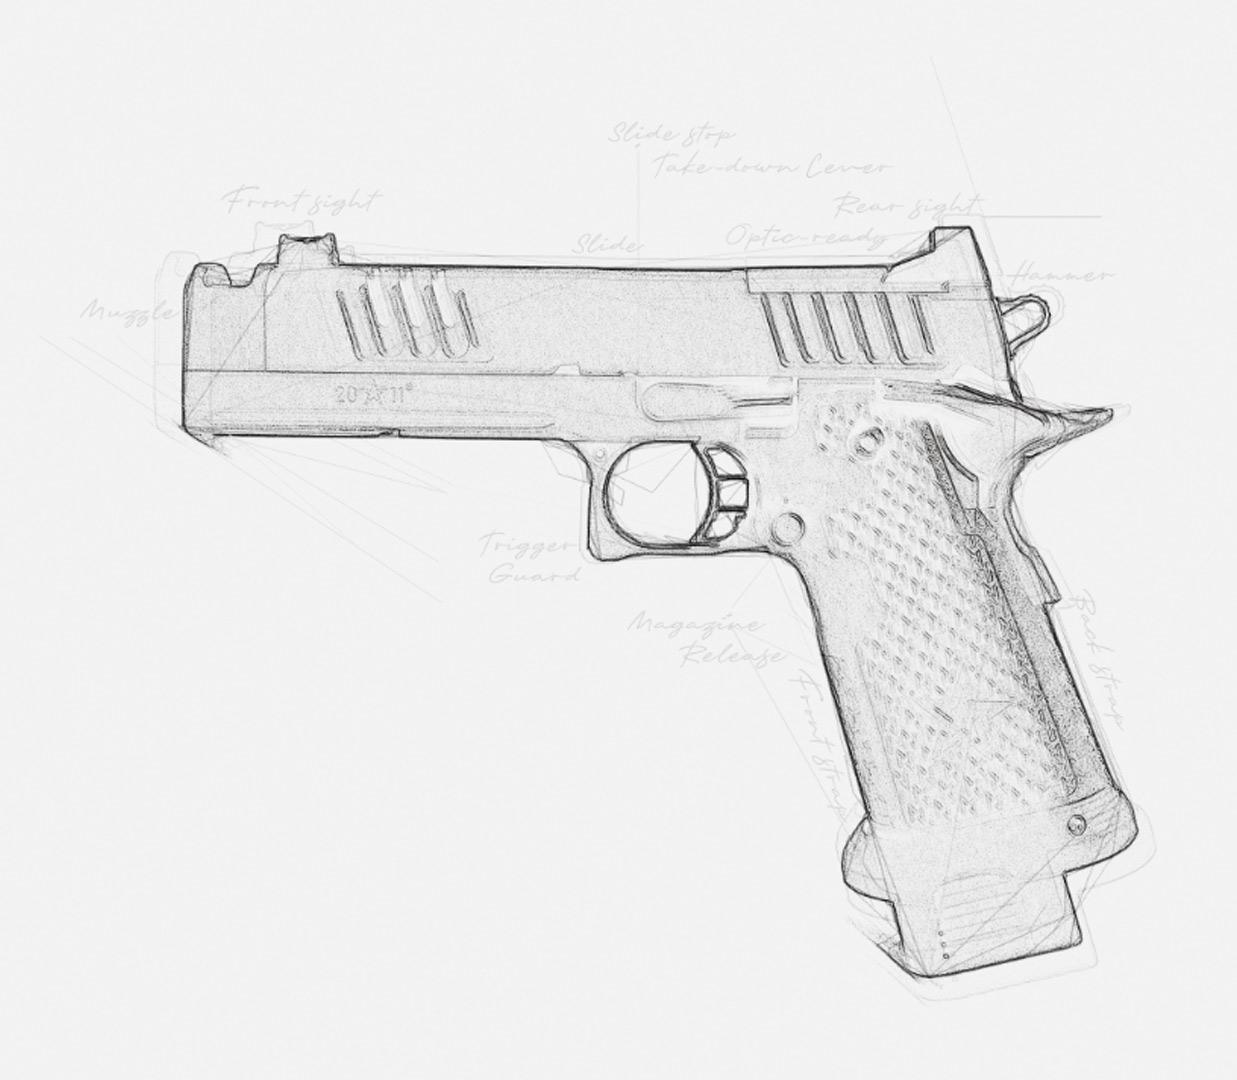 R&D sketch of Staccato handgun